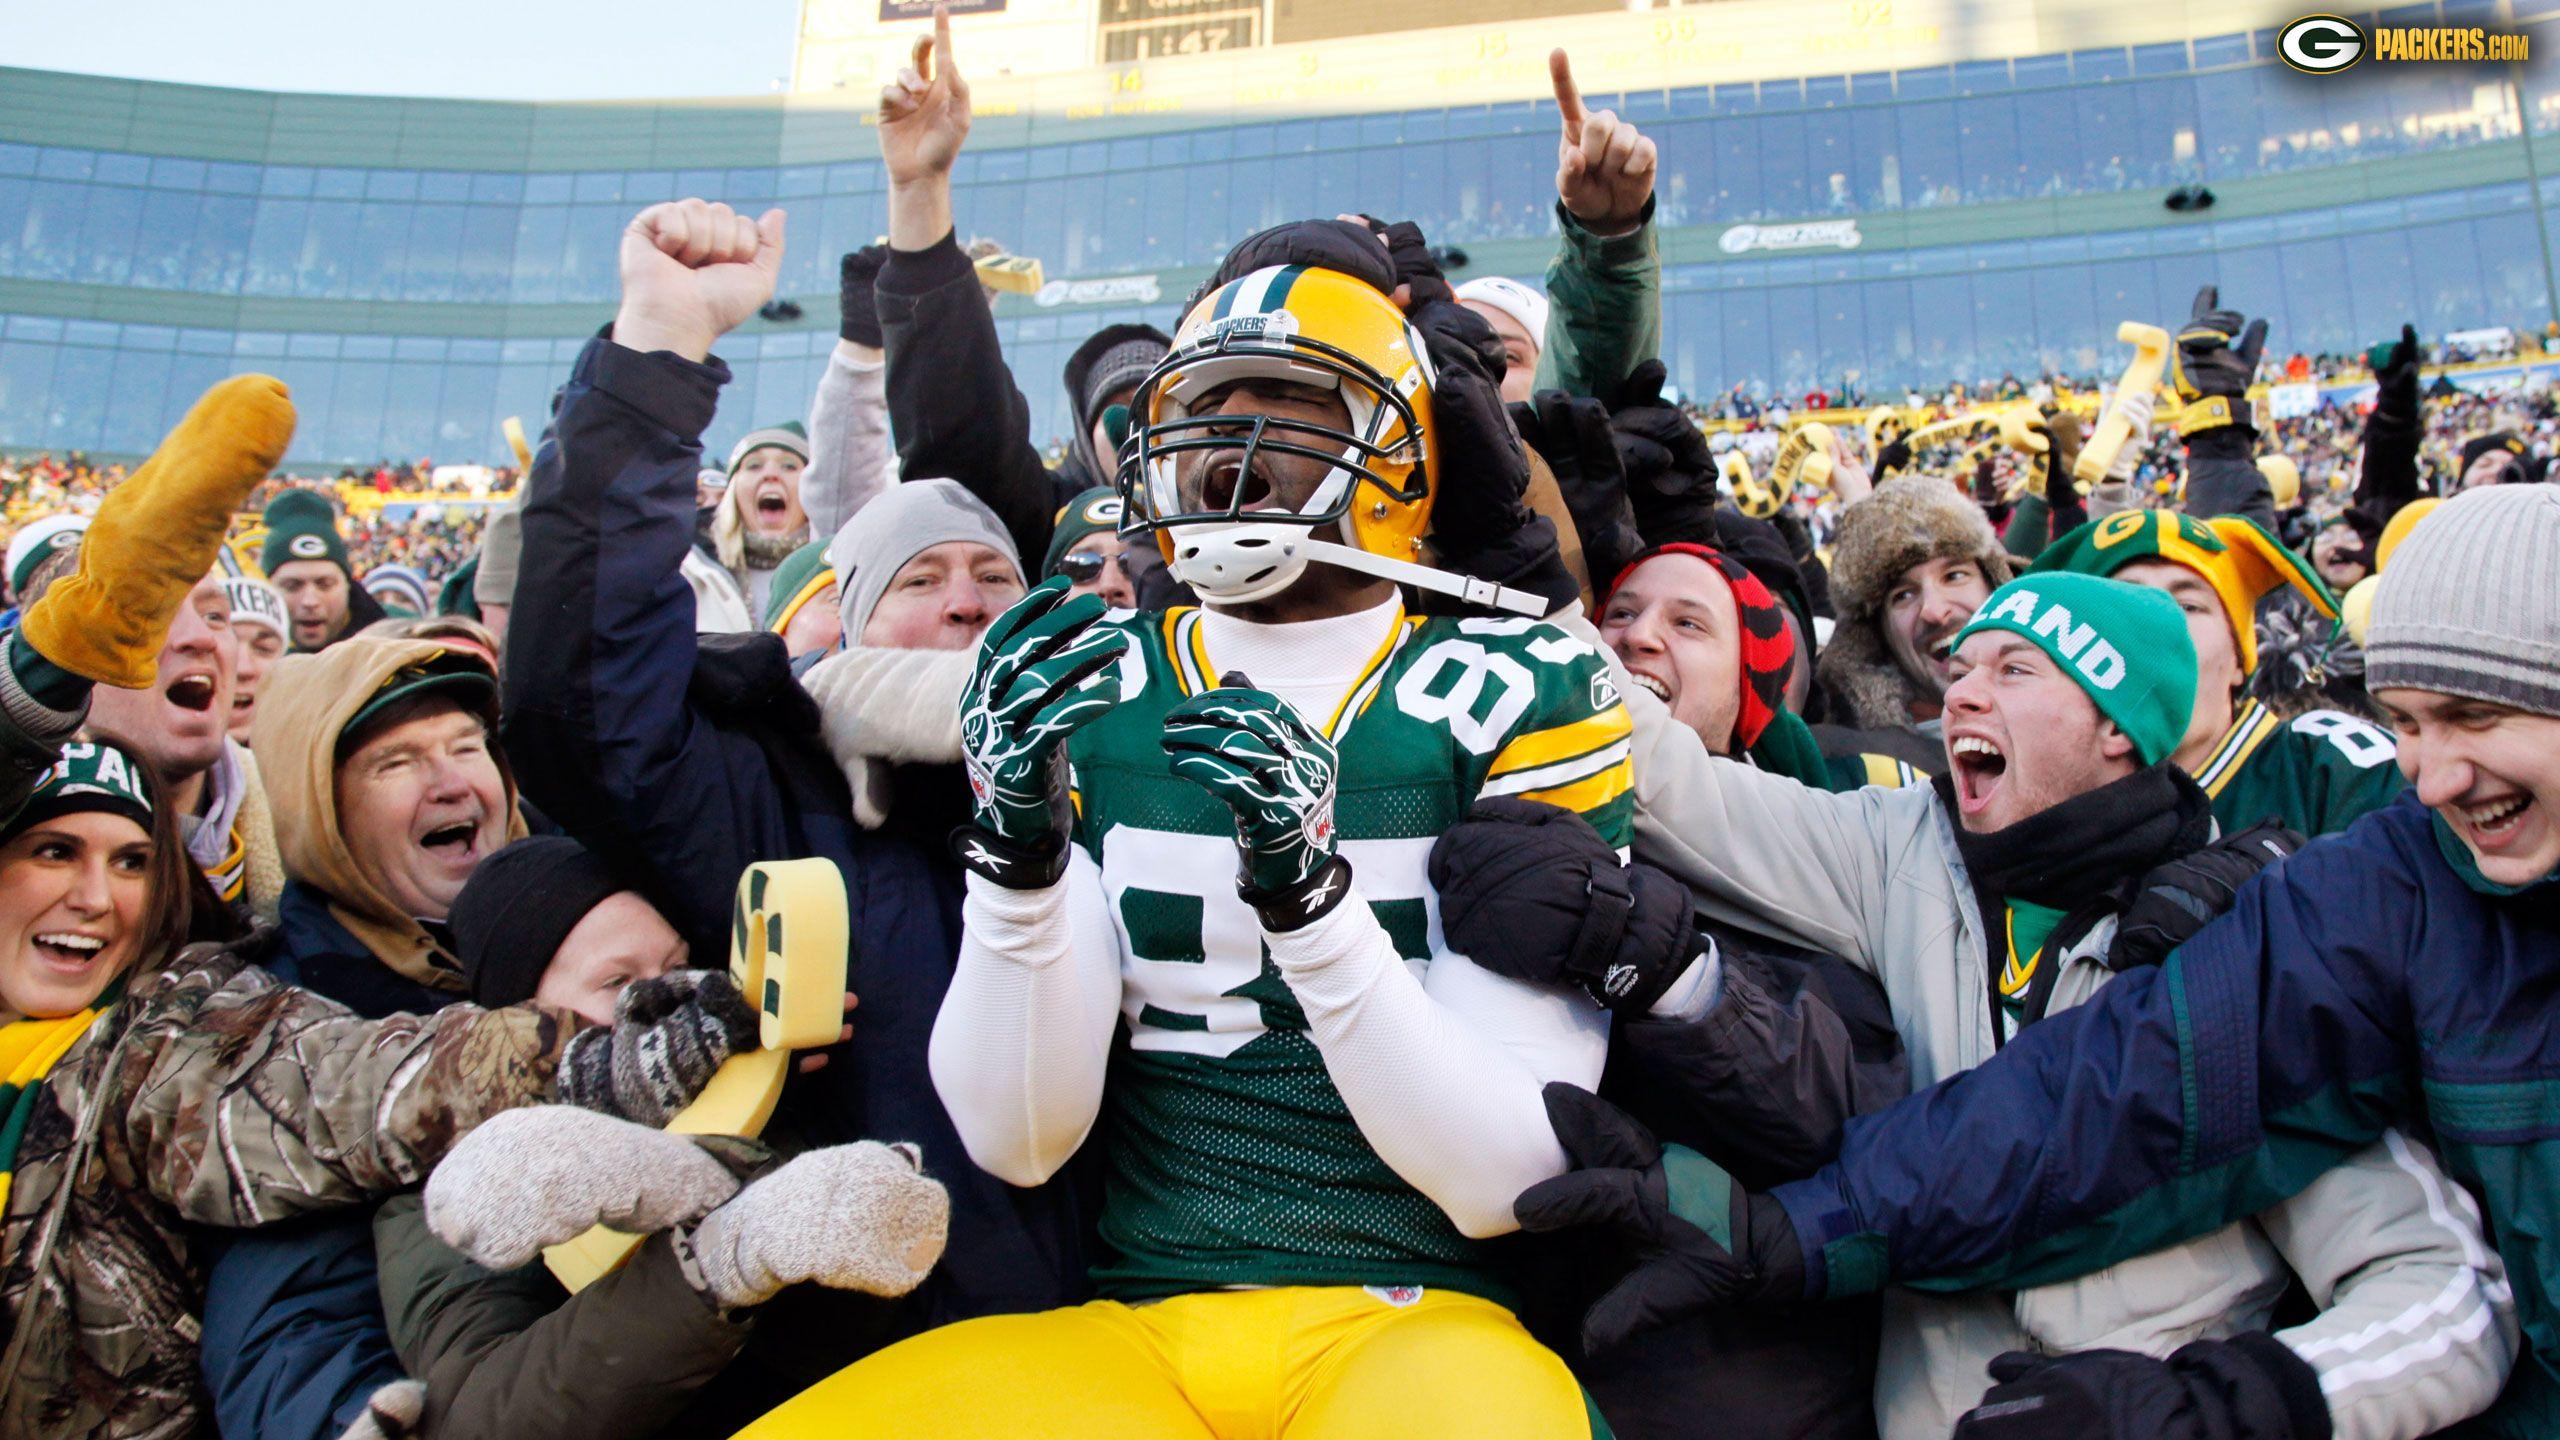 Lambeau Leap Rodgers Green Bay Green Bay Packers Green Bay